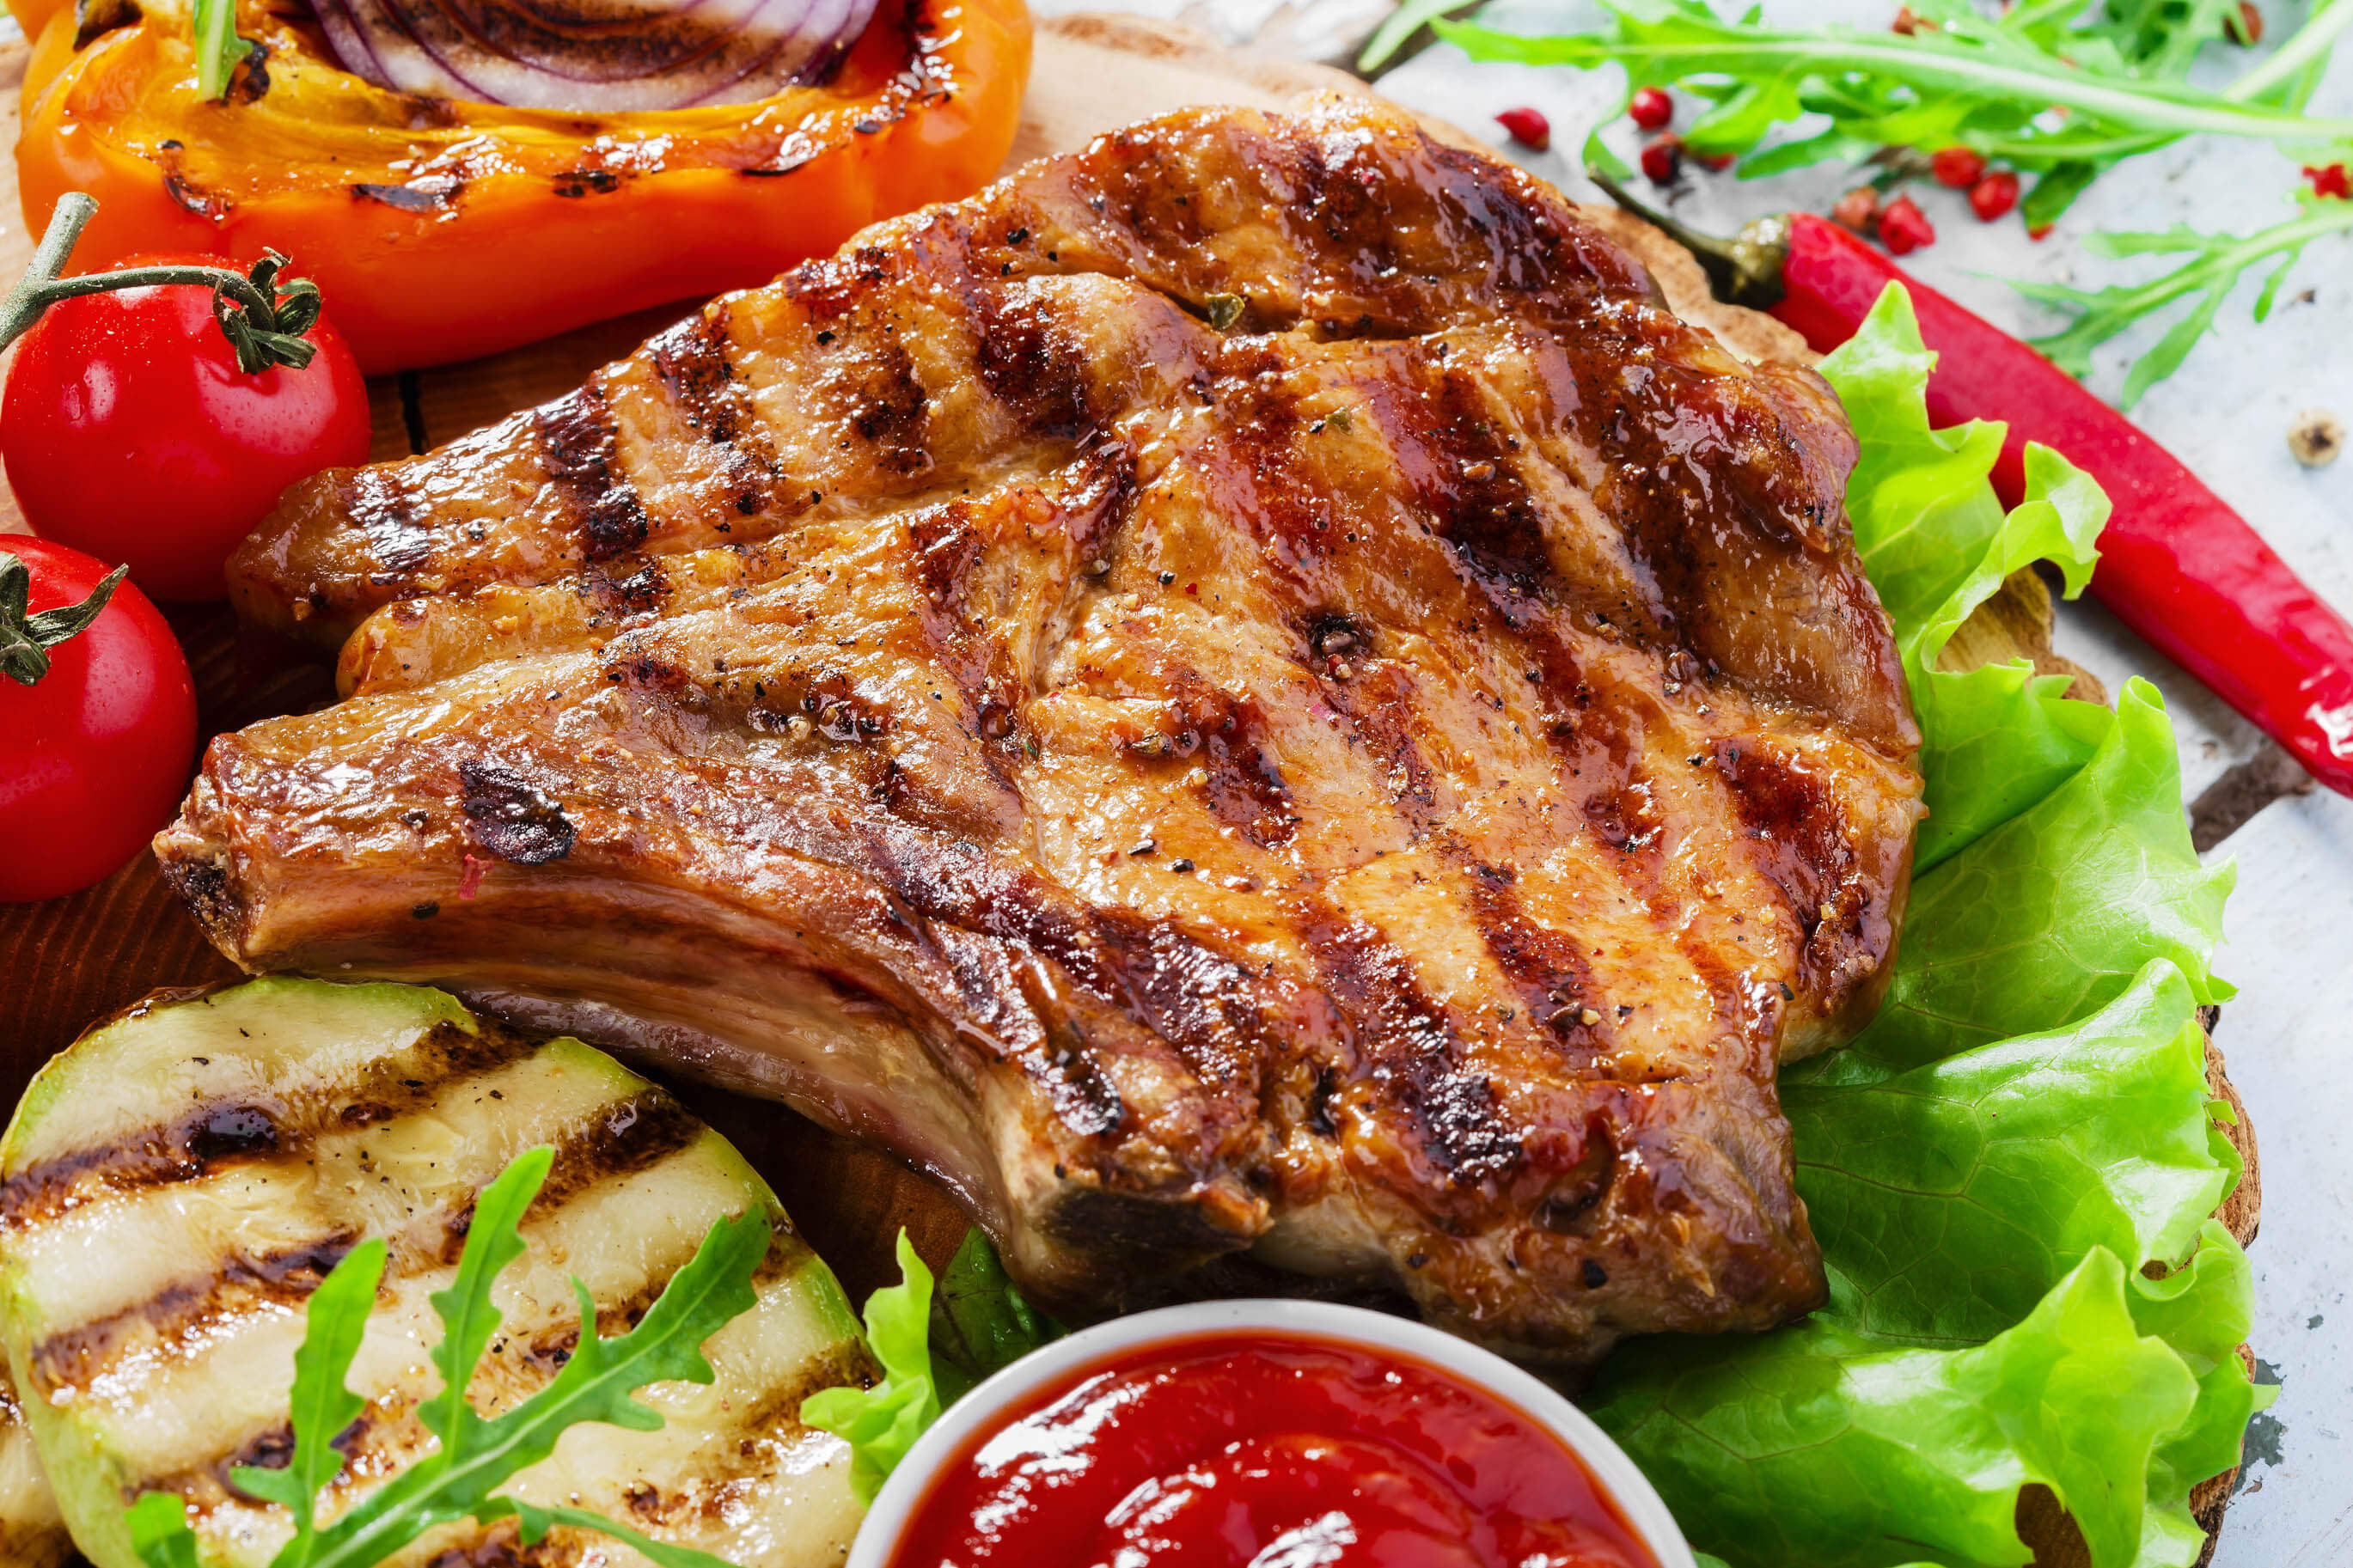 Is Pork Chops Healthy  Genetic engineering could make pork heart healthy if not